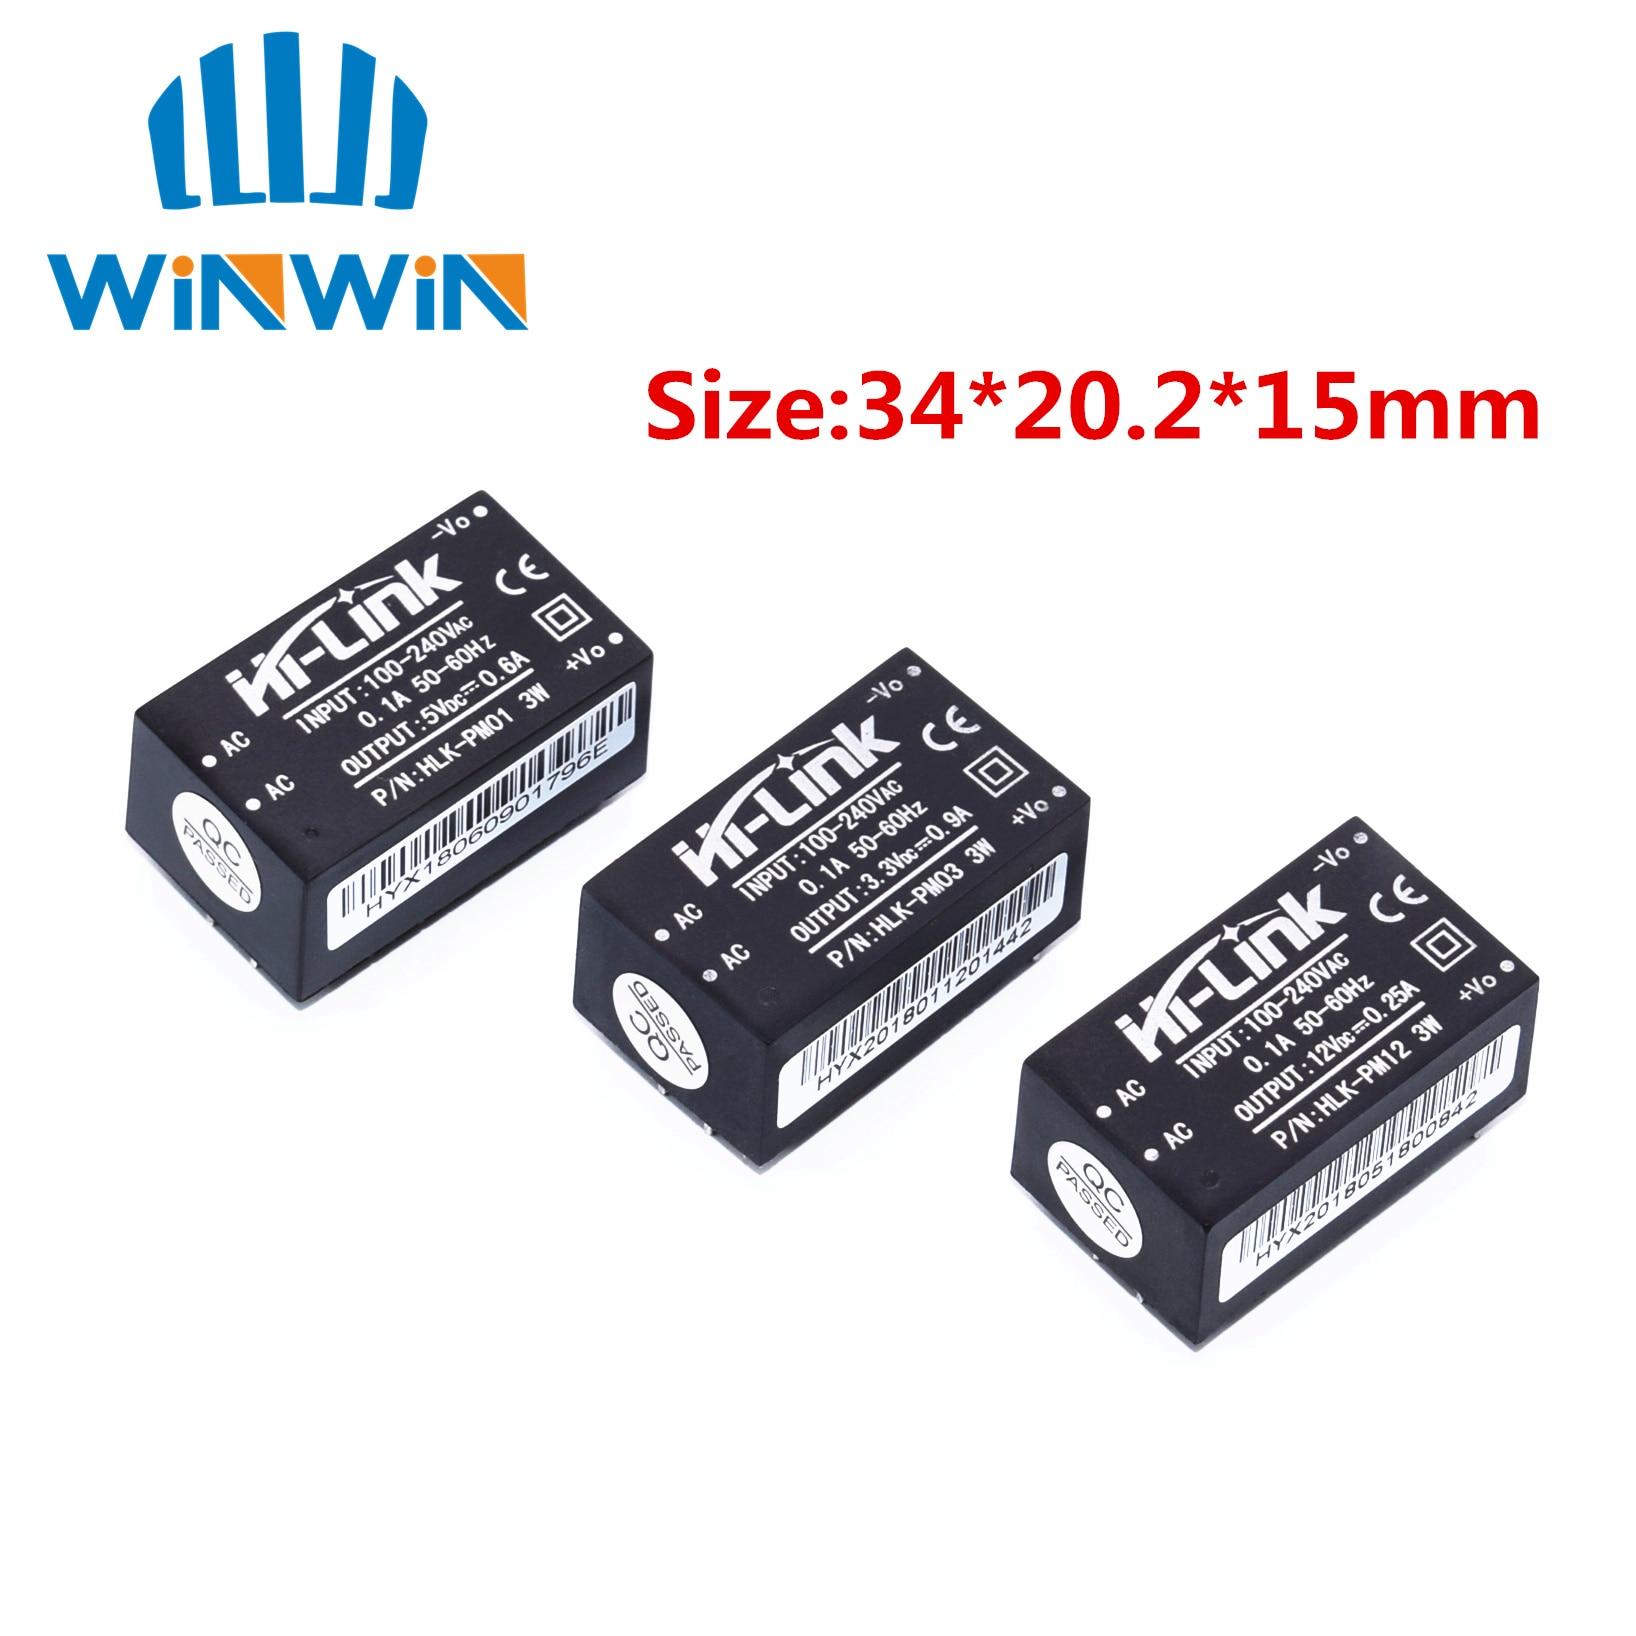 1pcs HLK-PM01 HLK-PM03 HLK-PM12 AC-DC 220V  Mini Power Supply Module,intelligent Household Switch Power Supply Module